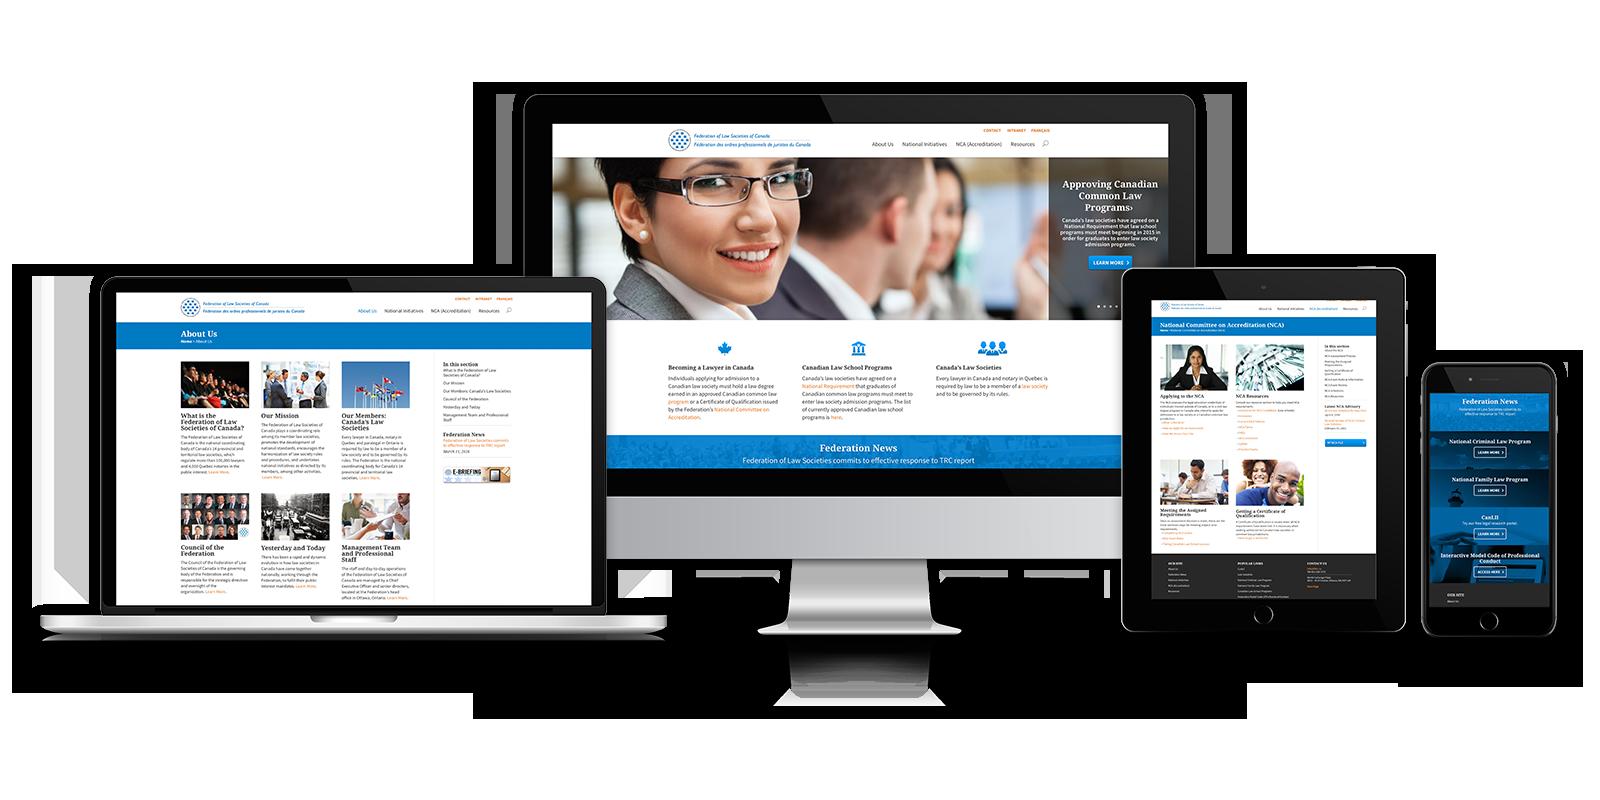 Flsc Baytek Ottawa Web Design Branding